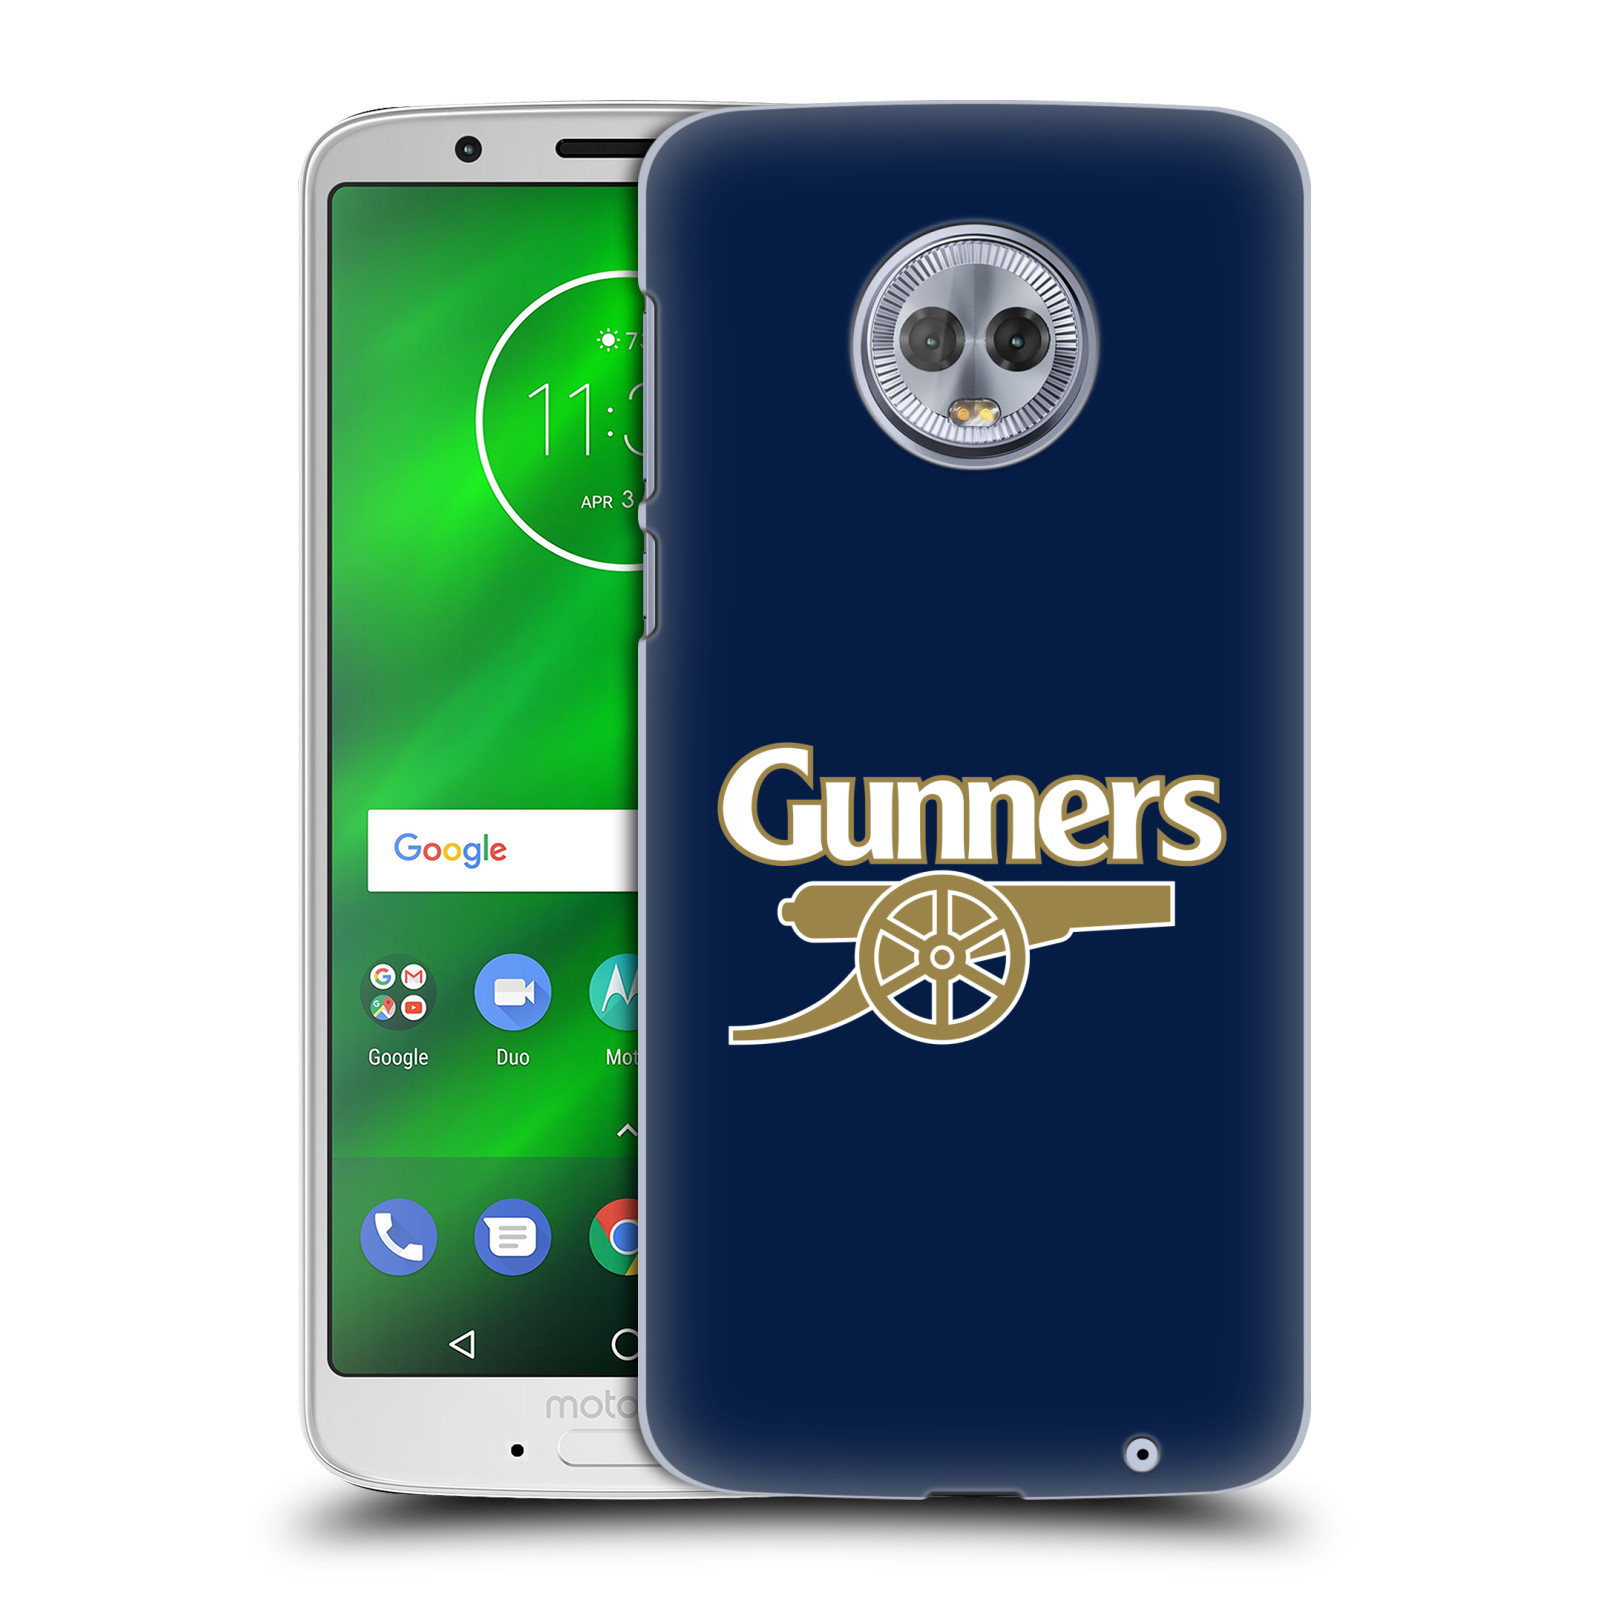 Plastové pouzdro na mobil Motorola Moto G6 Plus - Head Case - Arsenal FC - Gunners